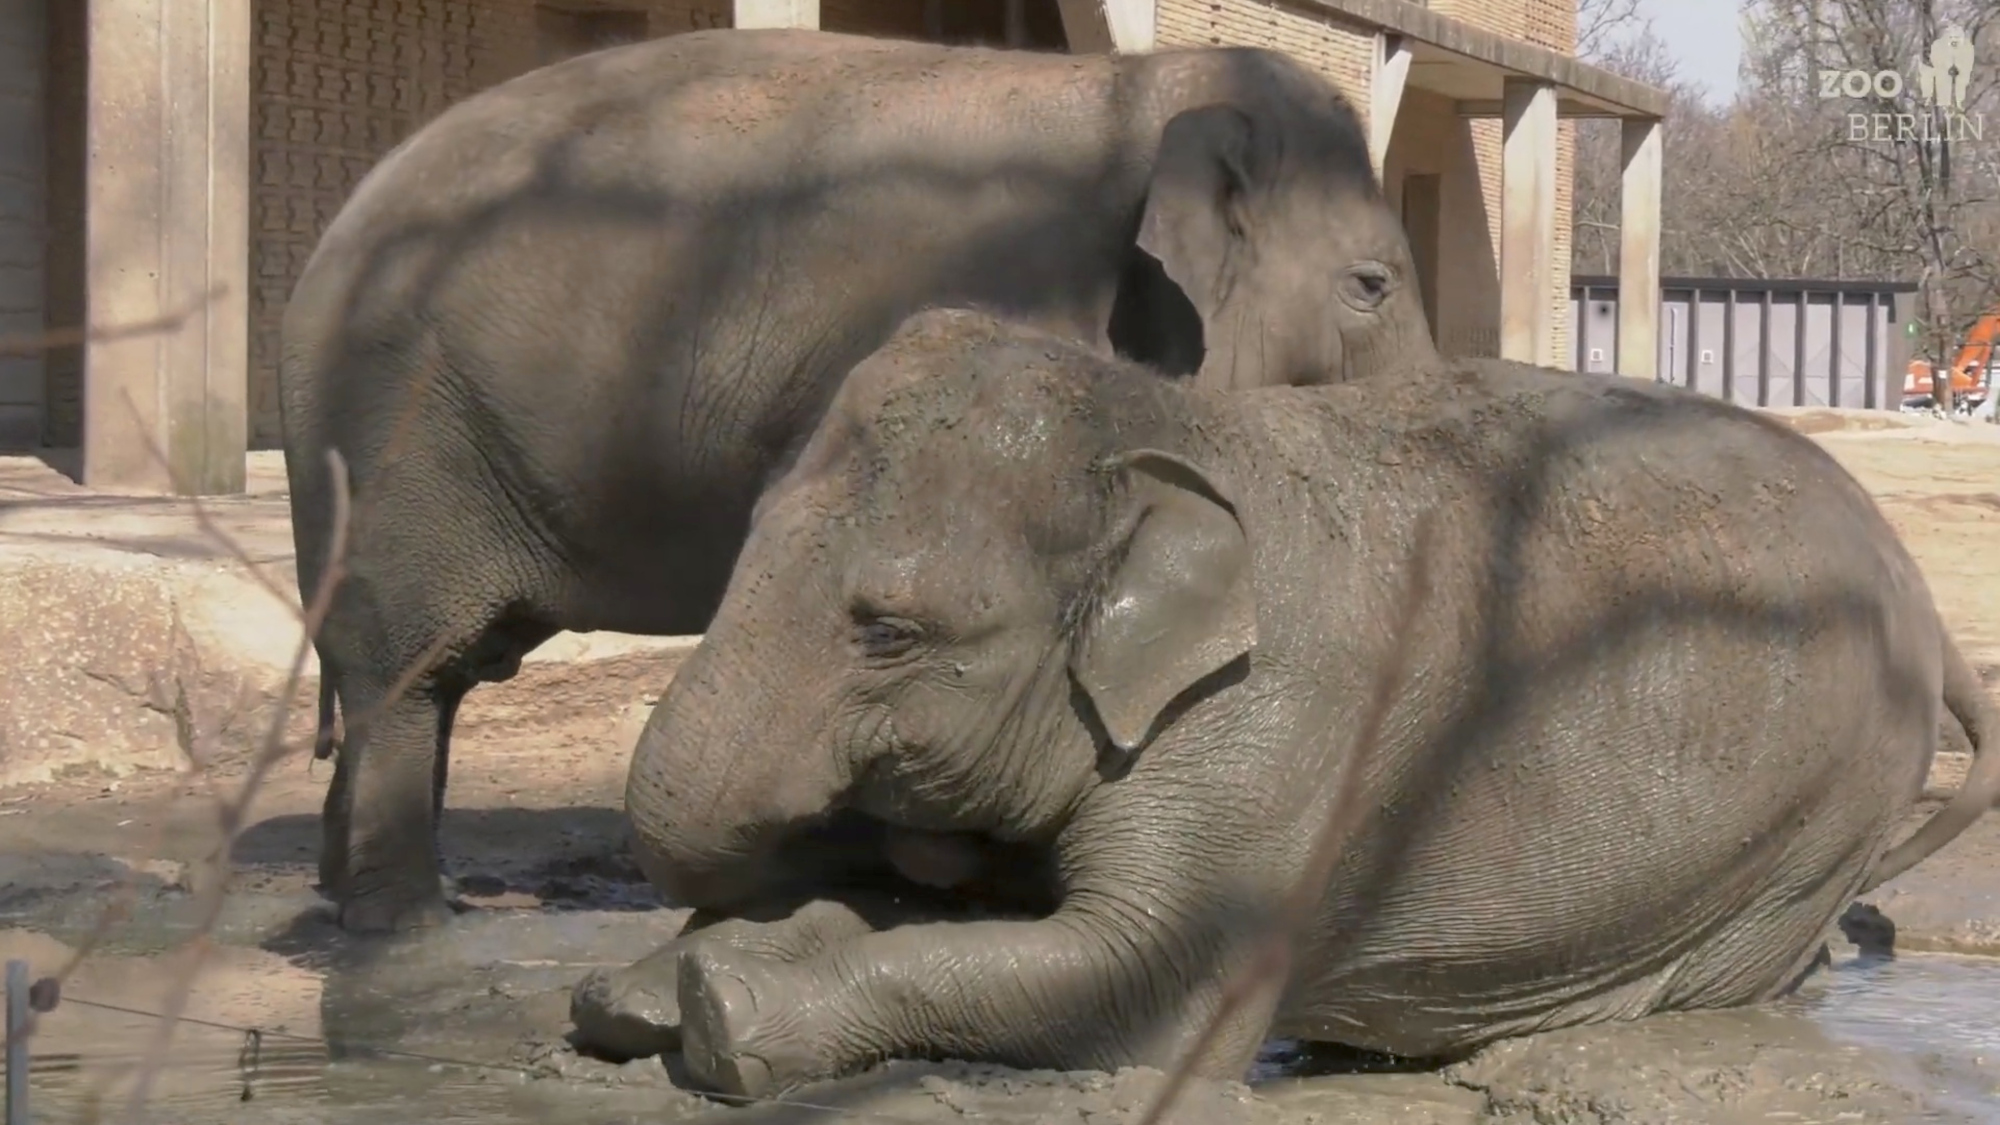 VIDEO: Muddy Marvelous: Female Elephants Get The Spa Treatment